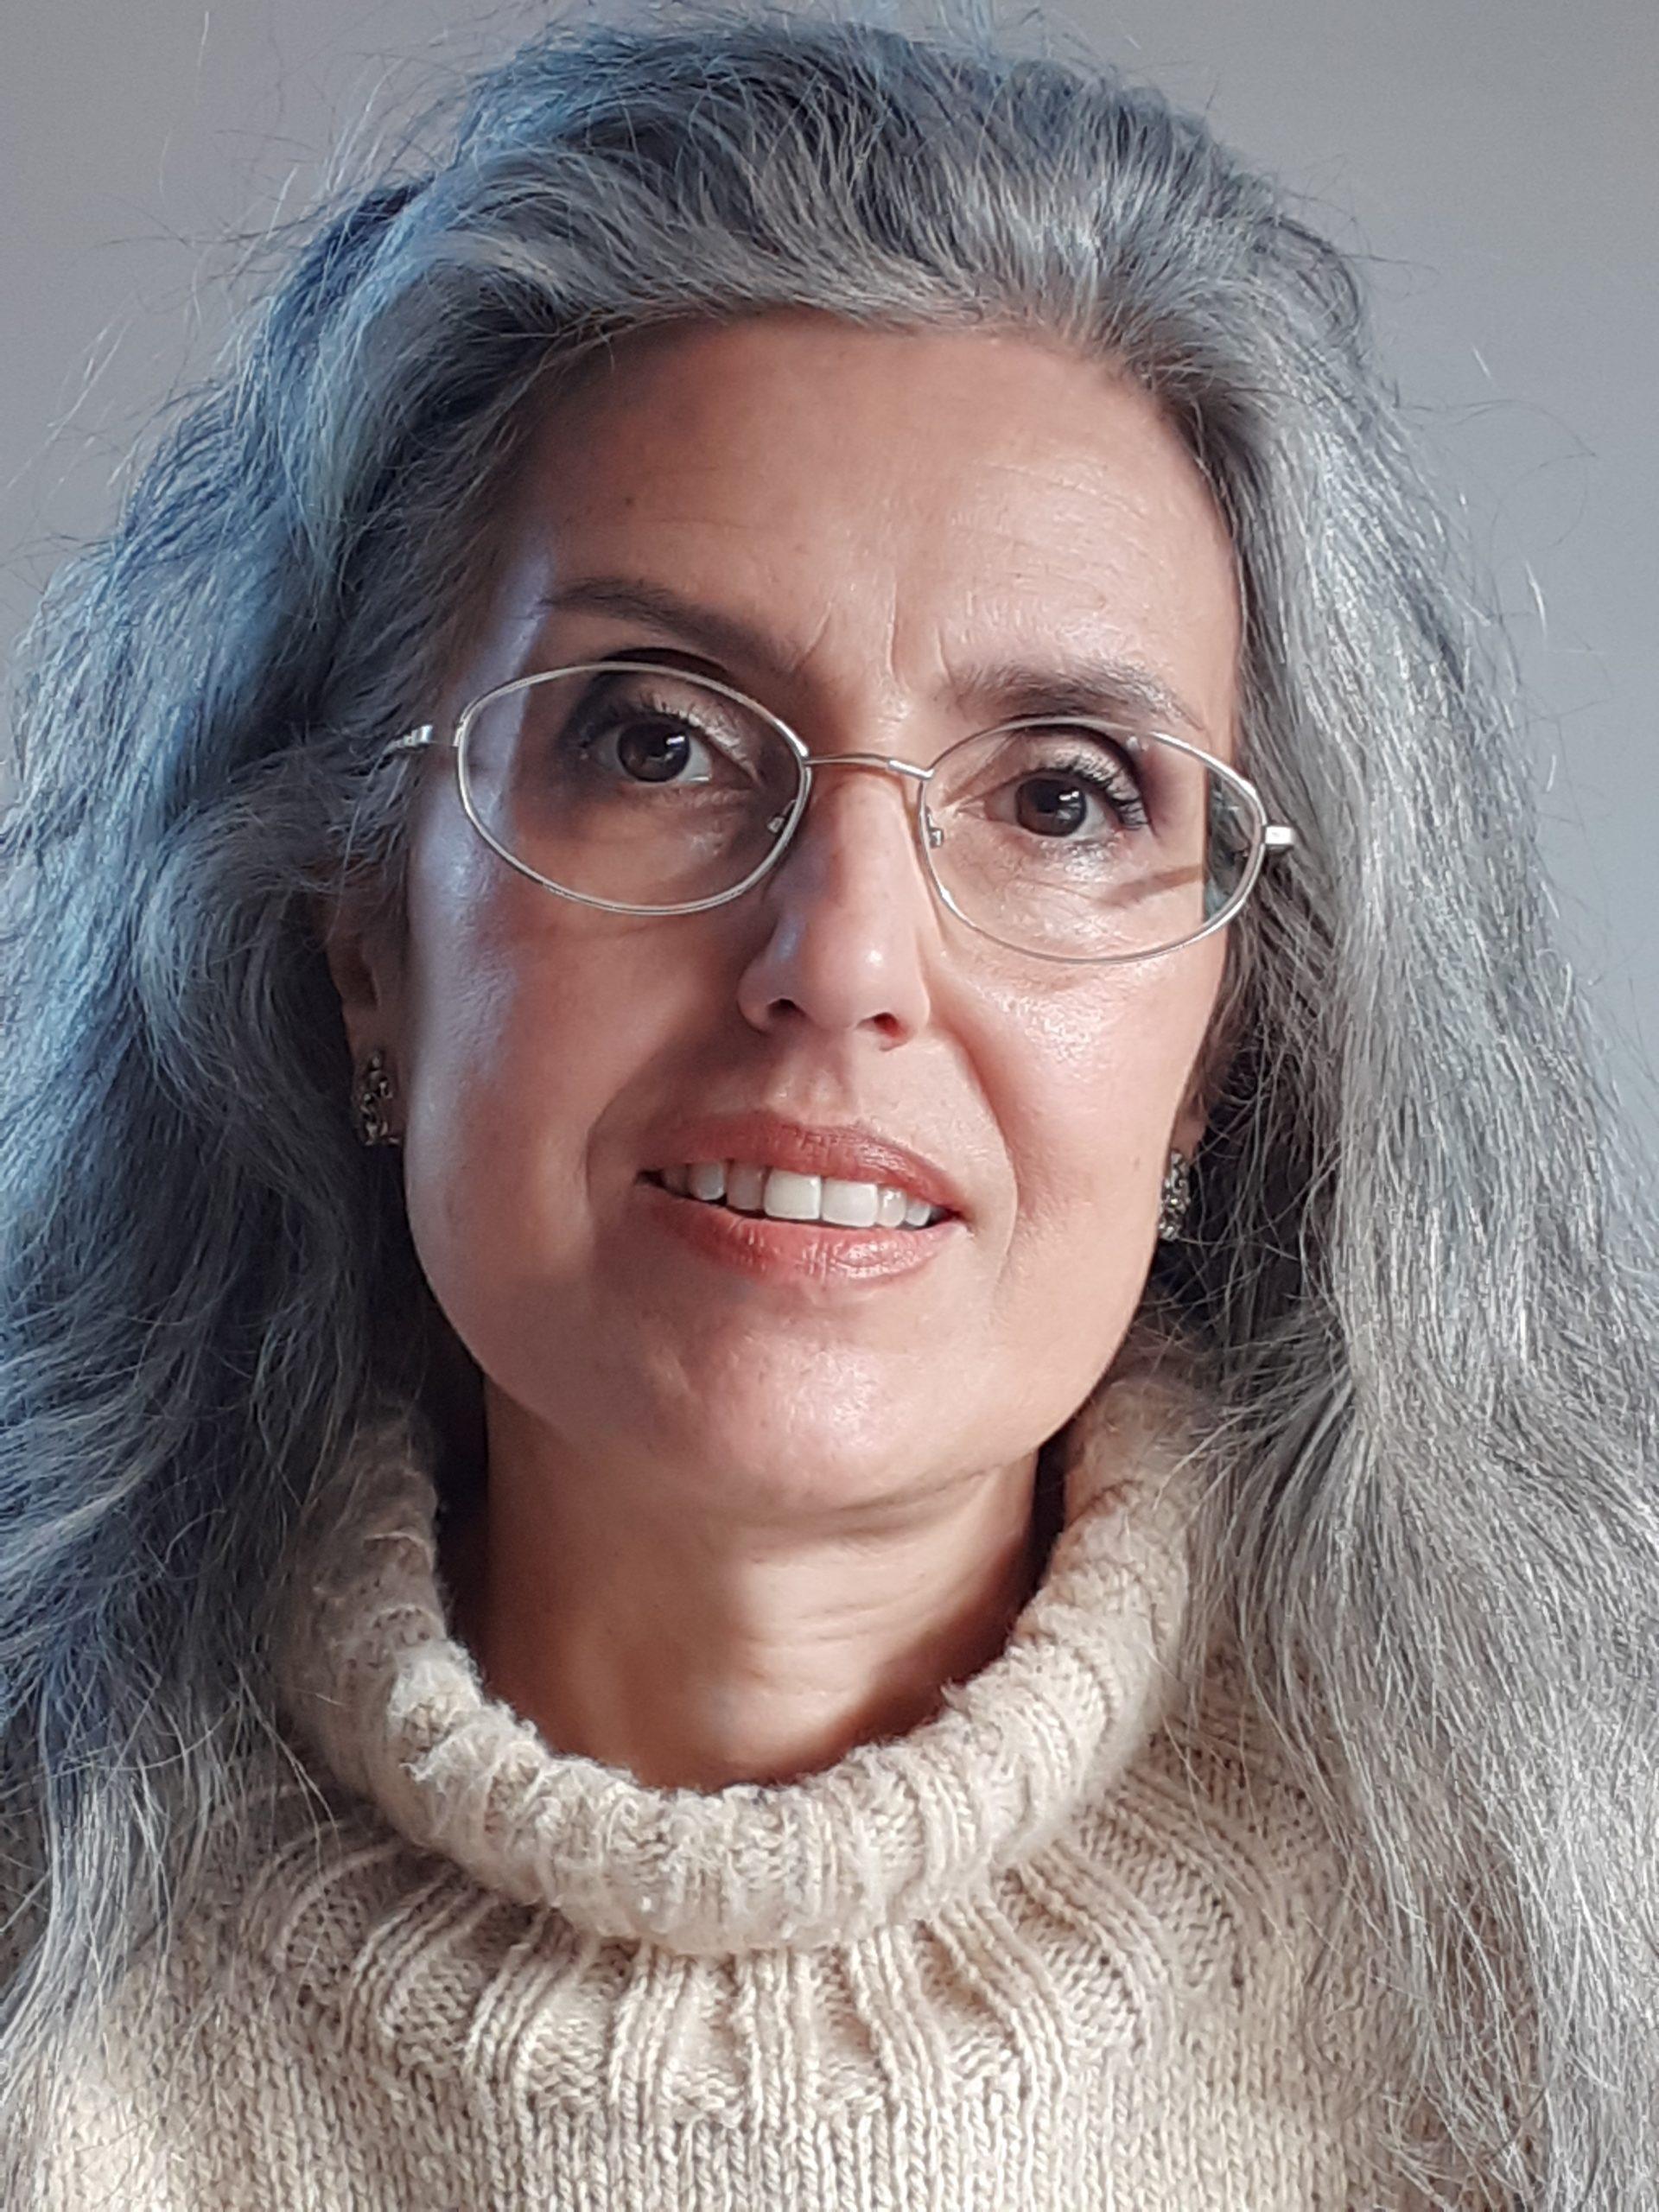 Mariagrazia Pelaia